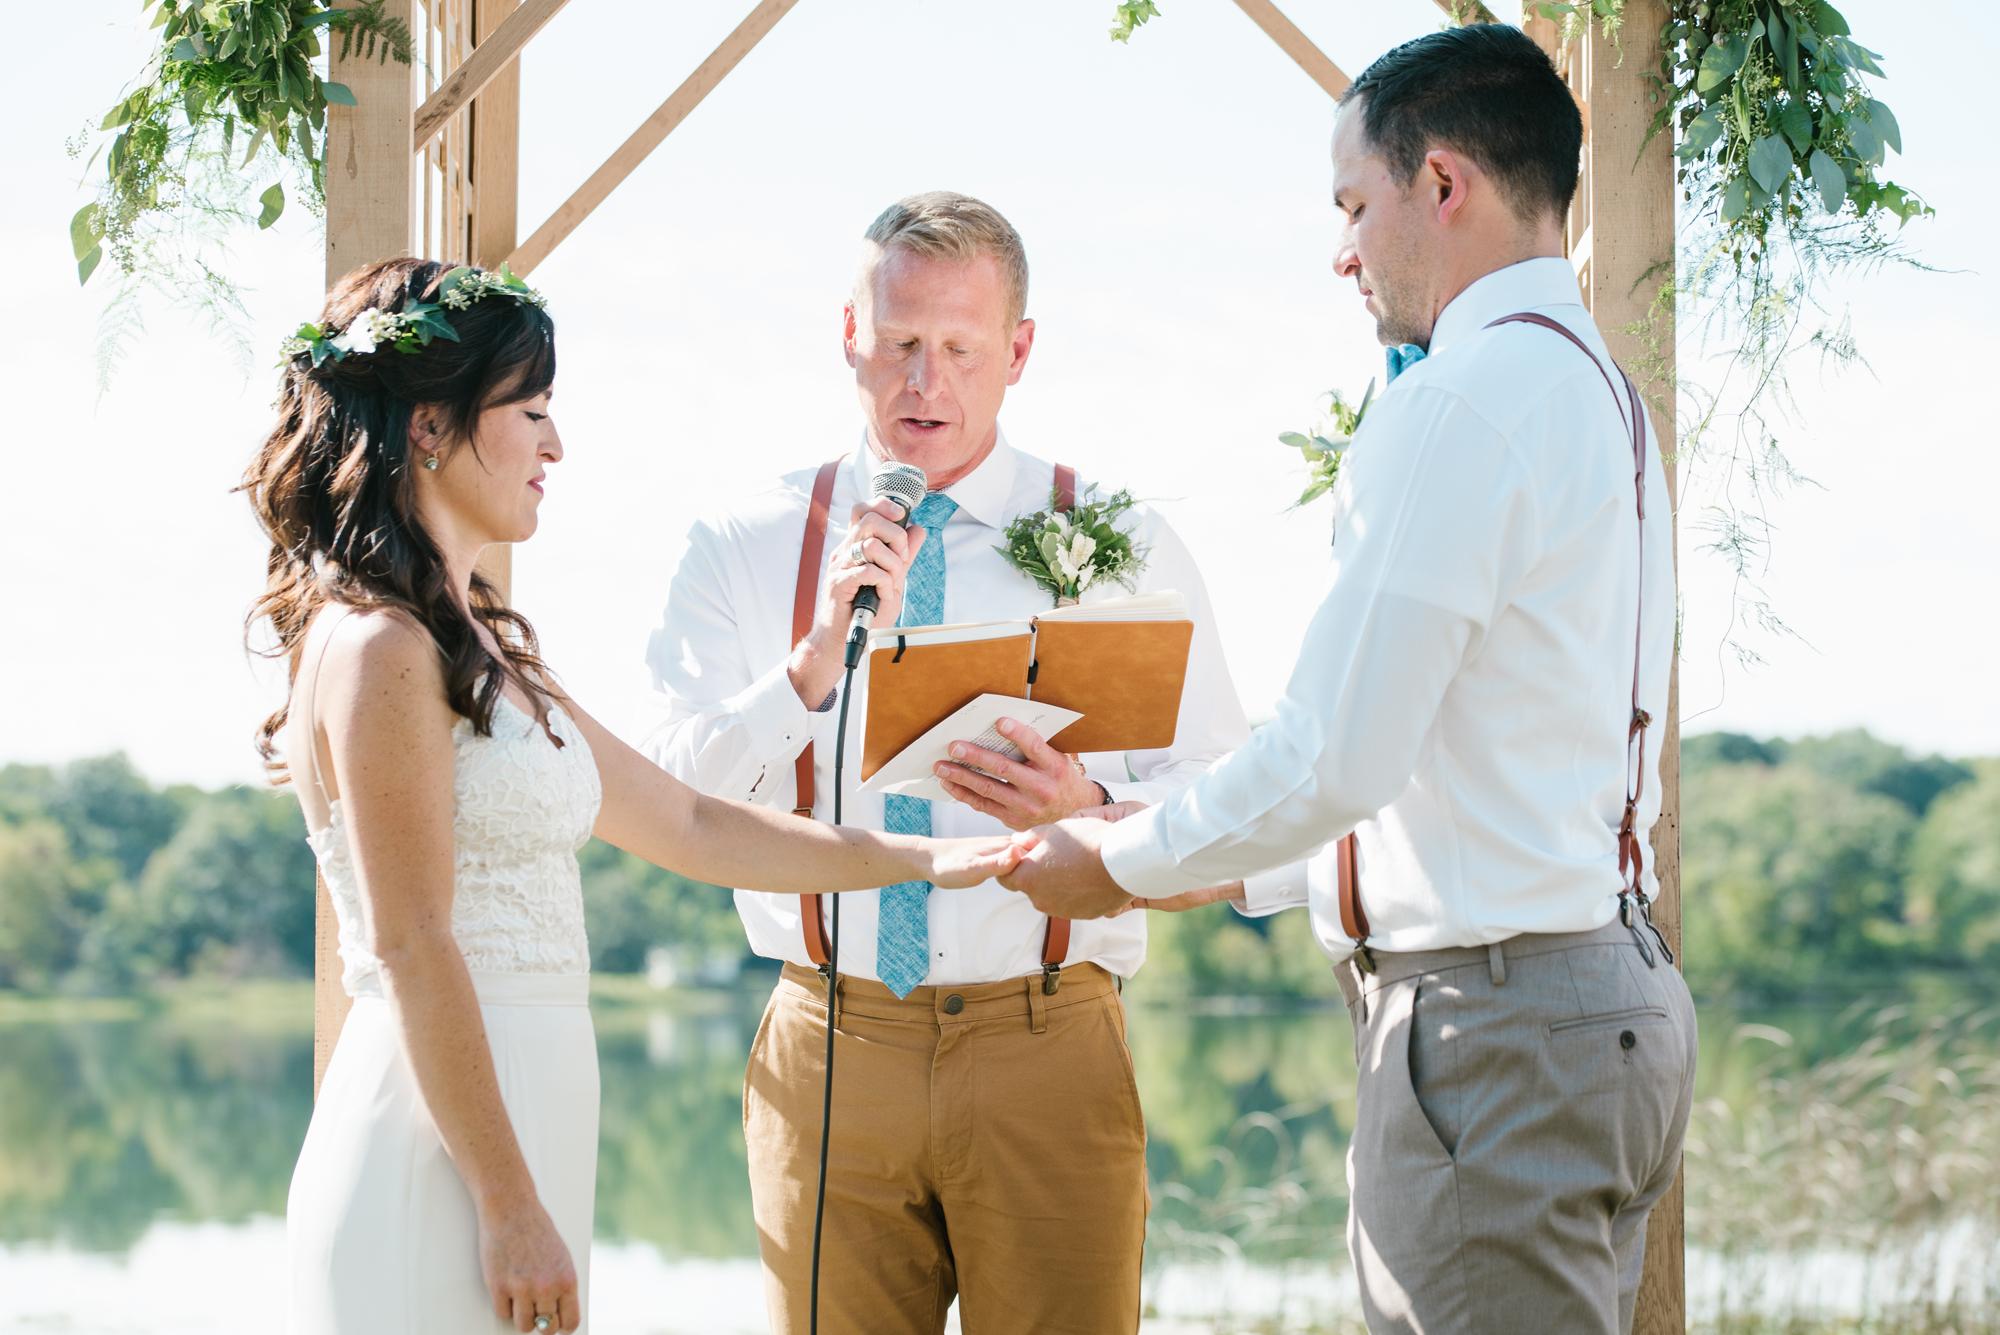 Quincy-Coldwater-Michigan-farm-wedding-photogapher-sydney-marie (179).jpg